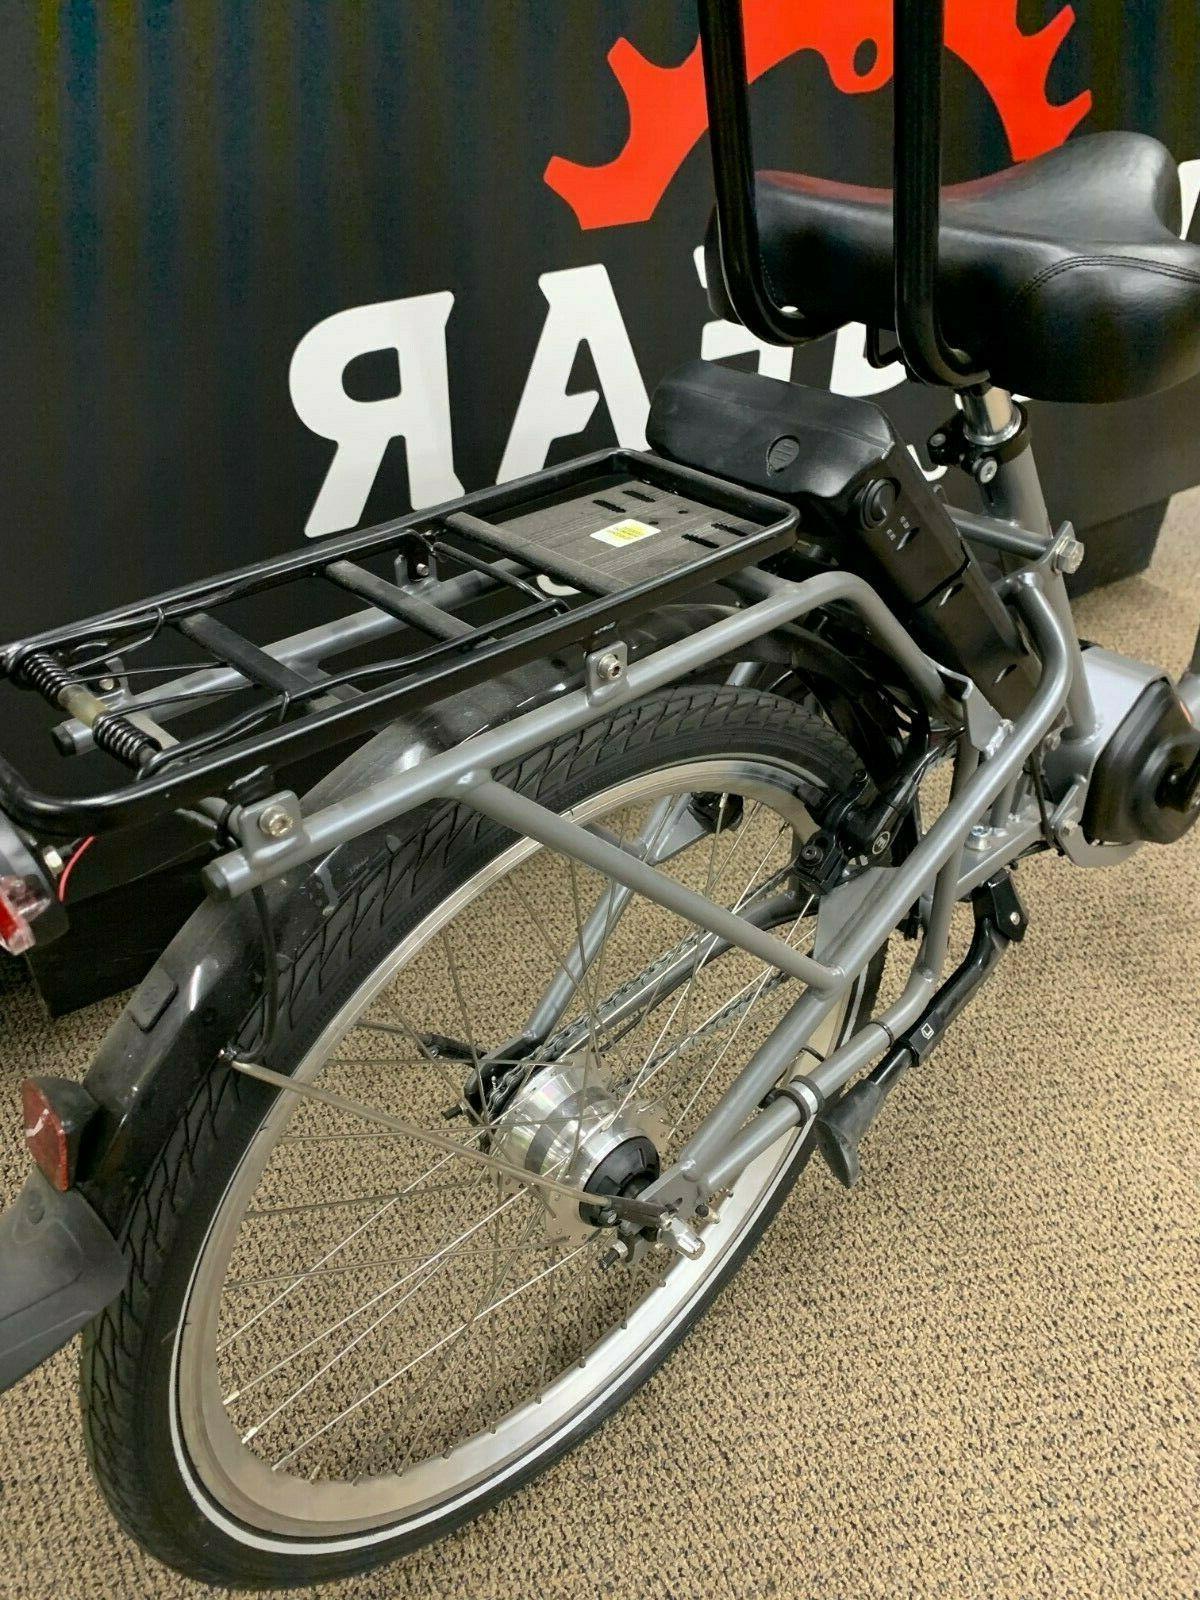 P-Tec Low Step-Thru, 24 Wheels, Bafang Mid-Drive